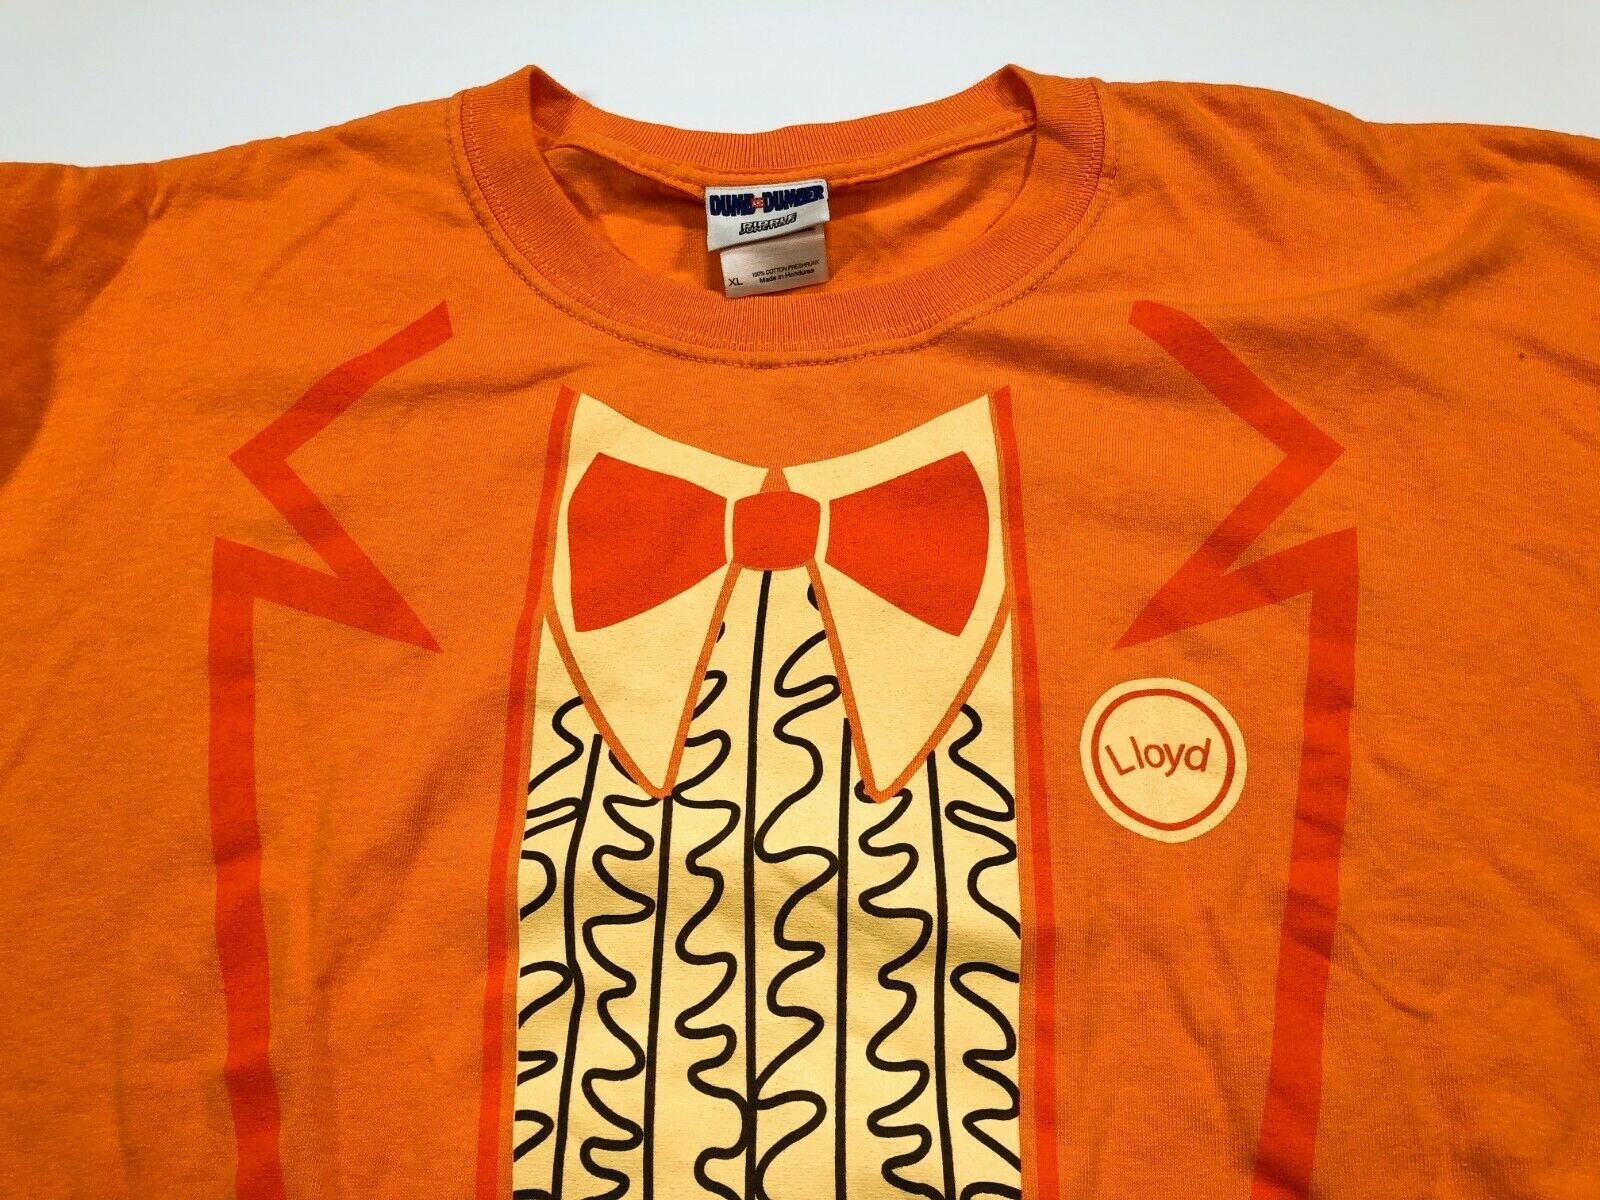 Dumb and Dumber Lloyd Orange Suit T-shirt XL Jim Carrey Lloyd Christmas